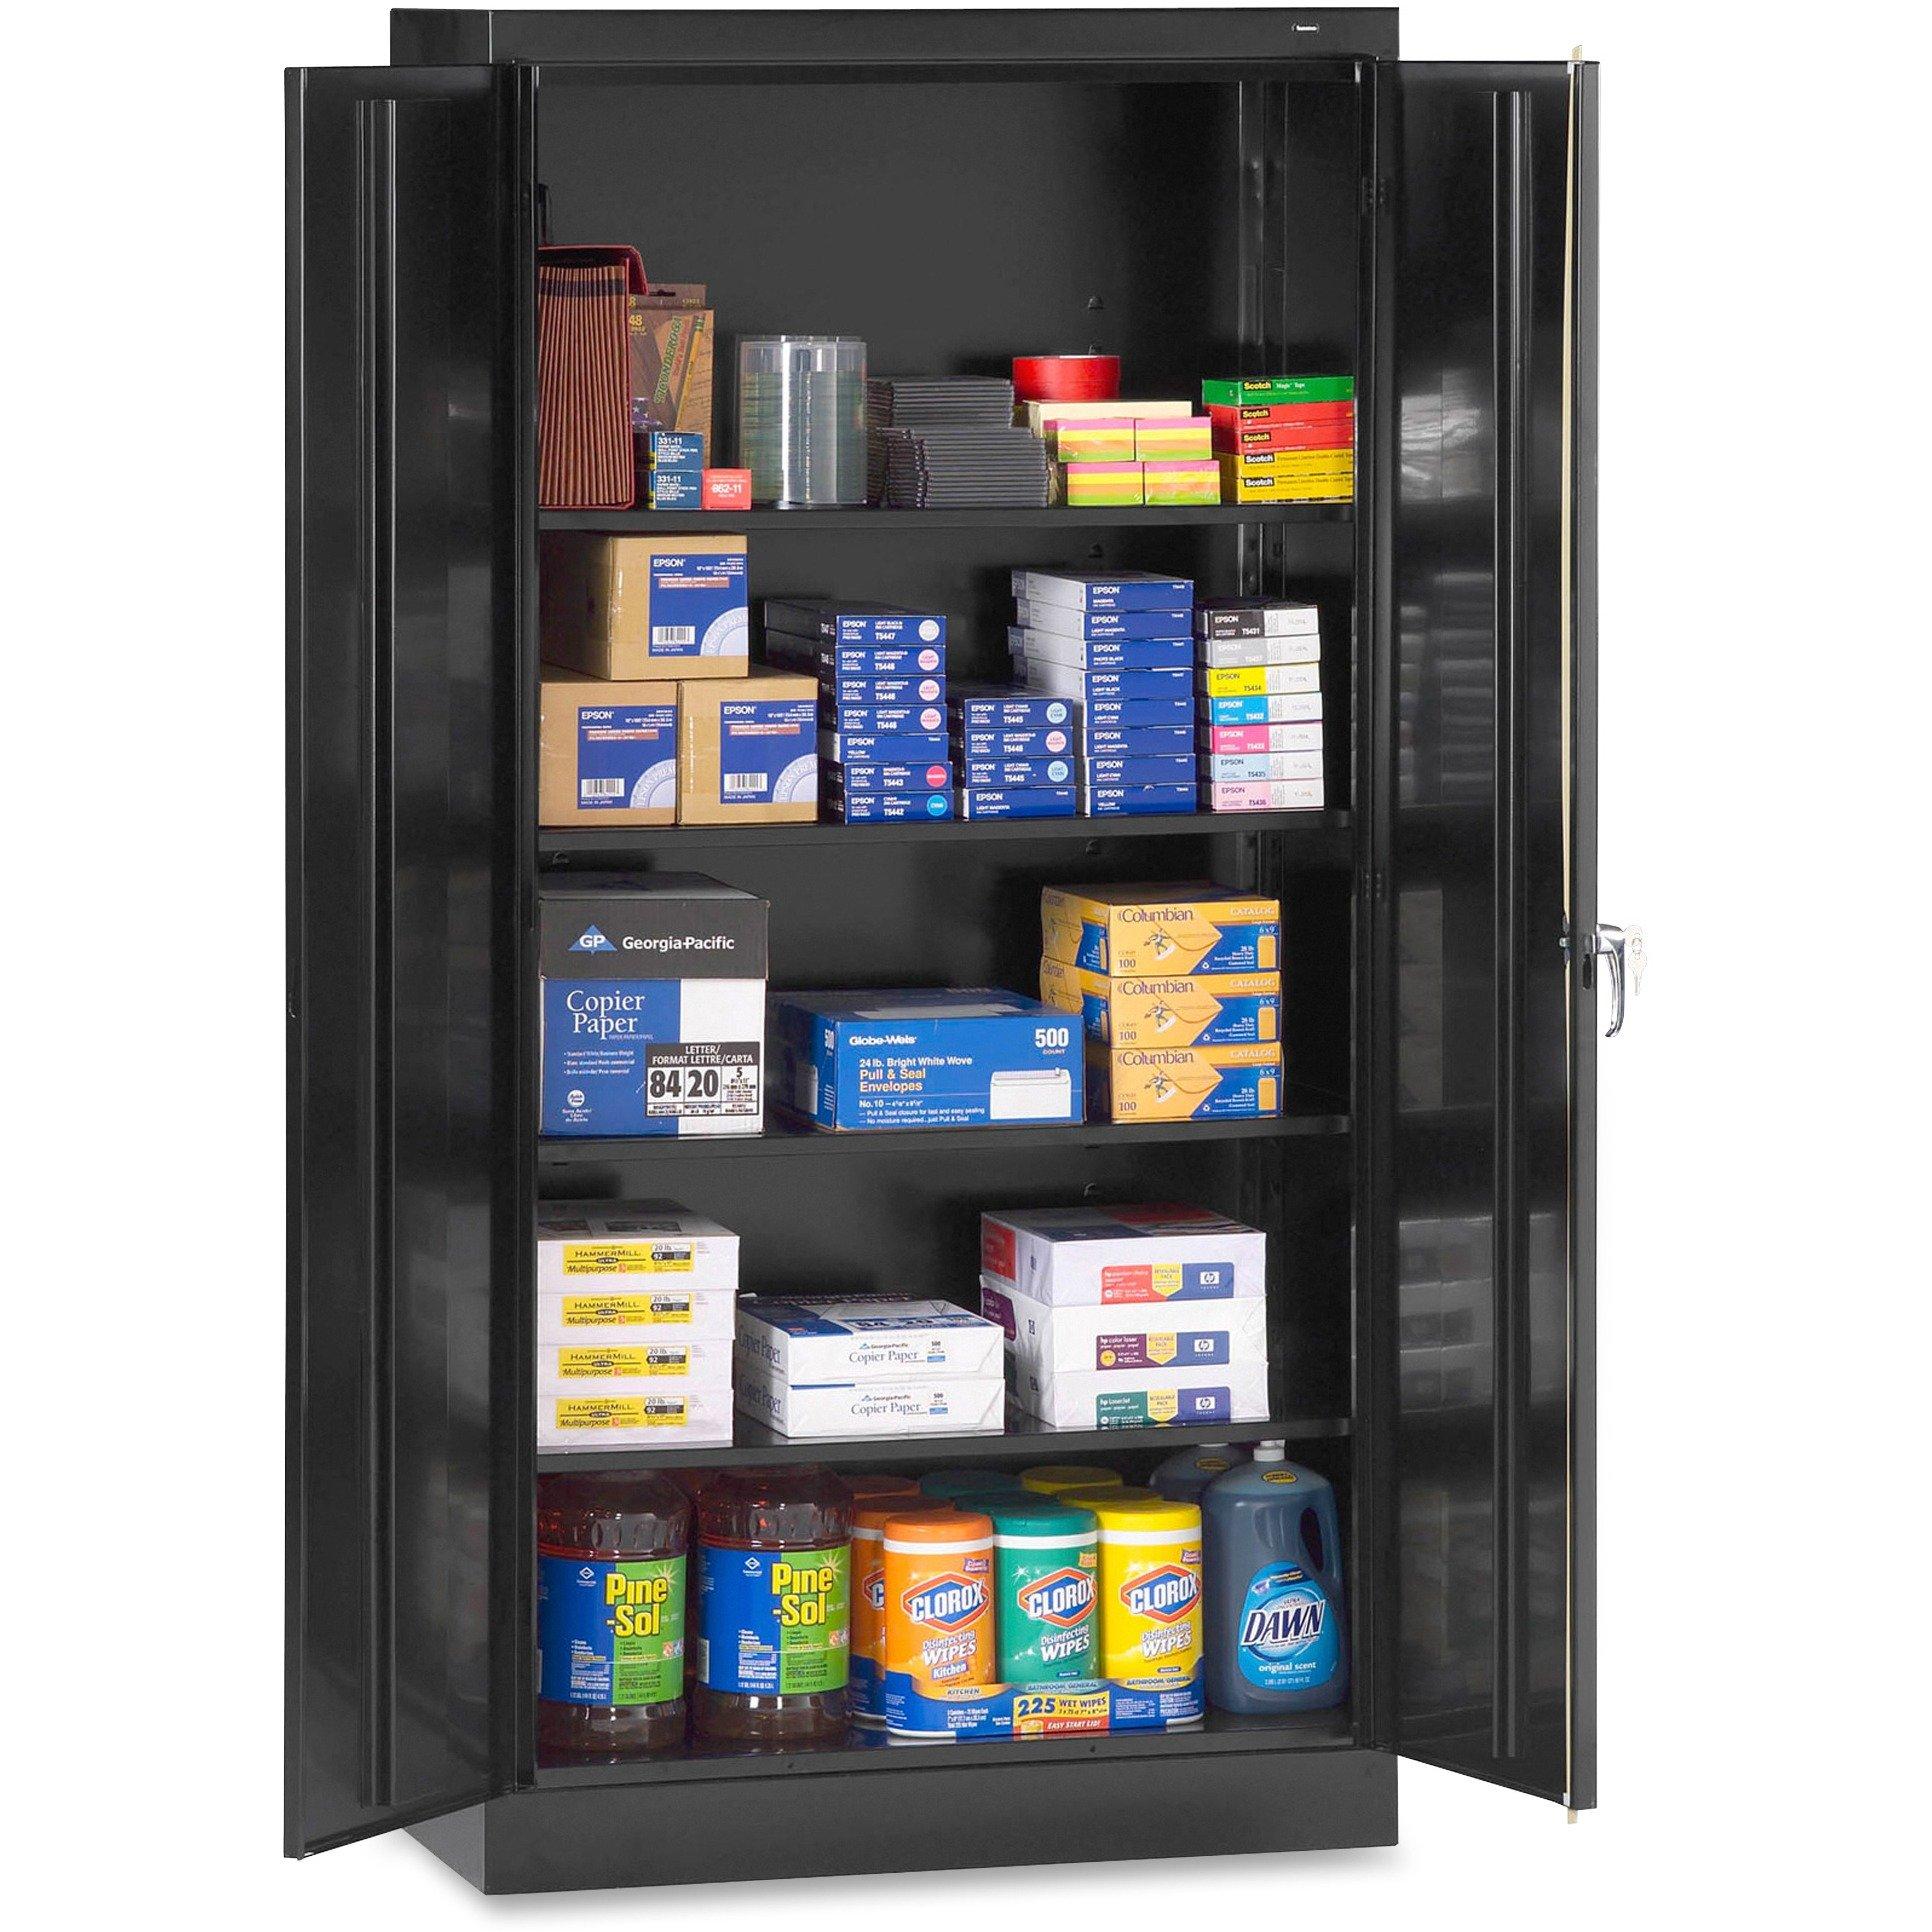 Tennsco 7218 24 Gauge Steel Standard Welded Storage Cabinet, 4 Shelves, 150 lbs Capacity per Shelf, 36'' Width x 72'' Height x 18'' Depth, Black